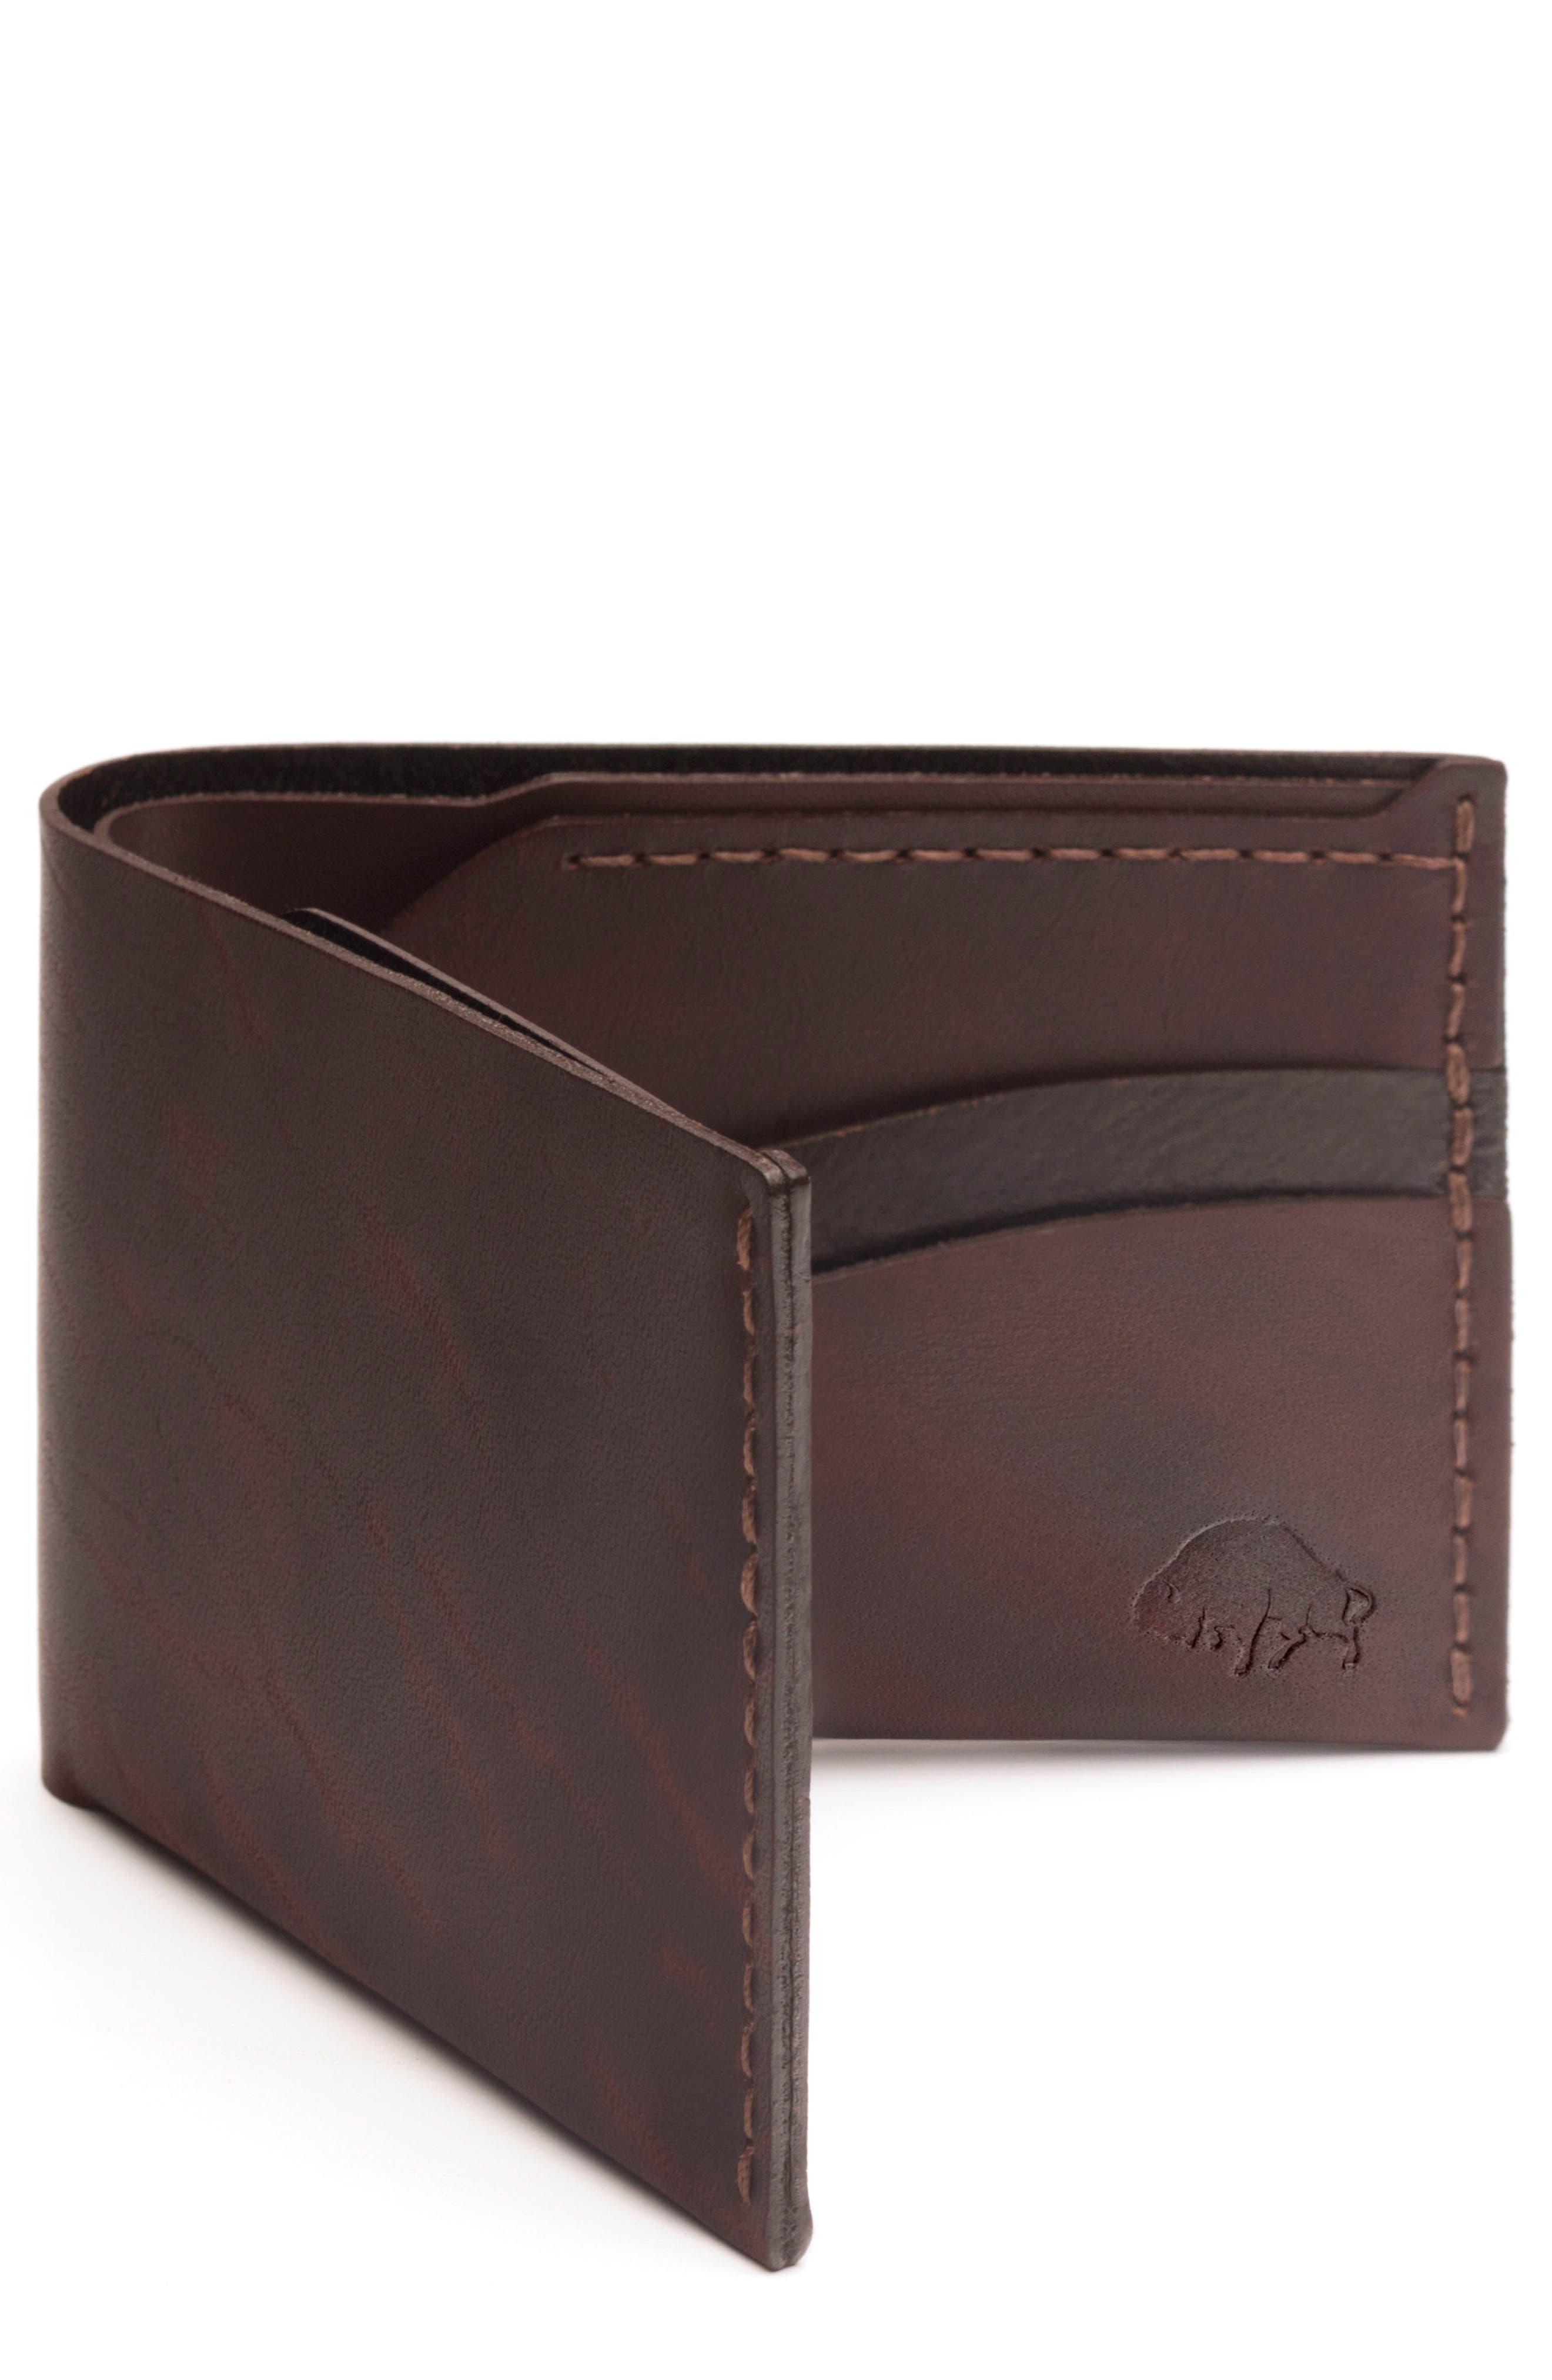 EZRA ARTHUR No. 6 Leather Wallet